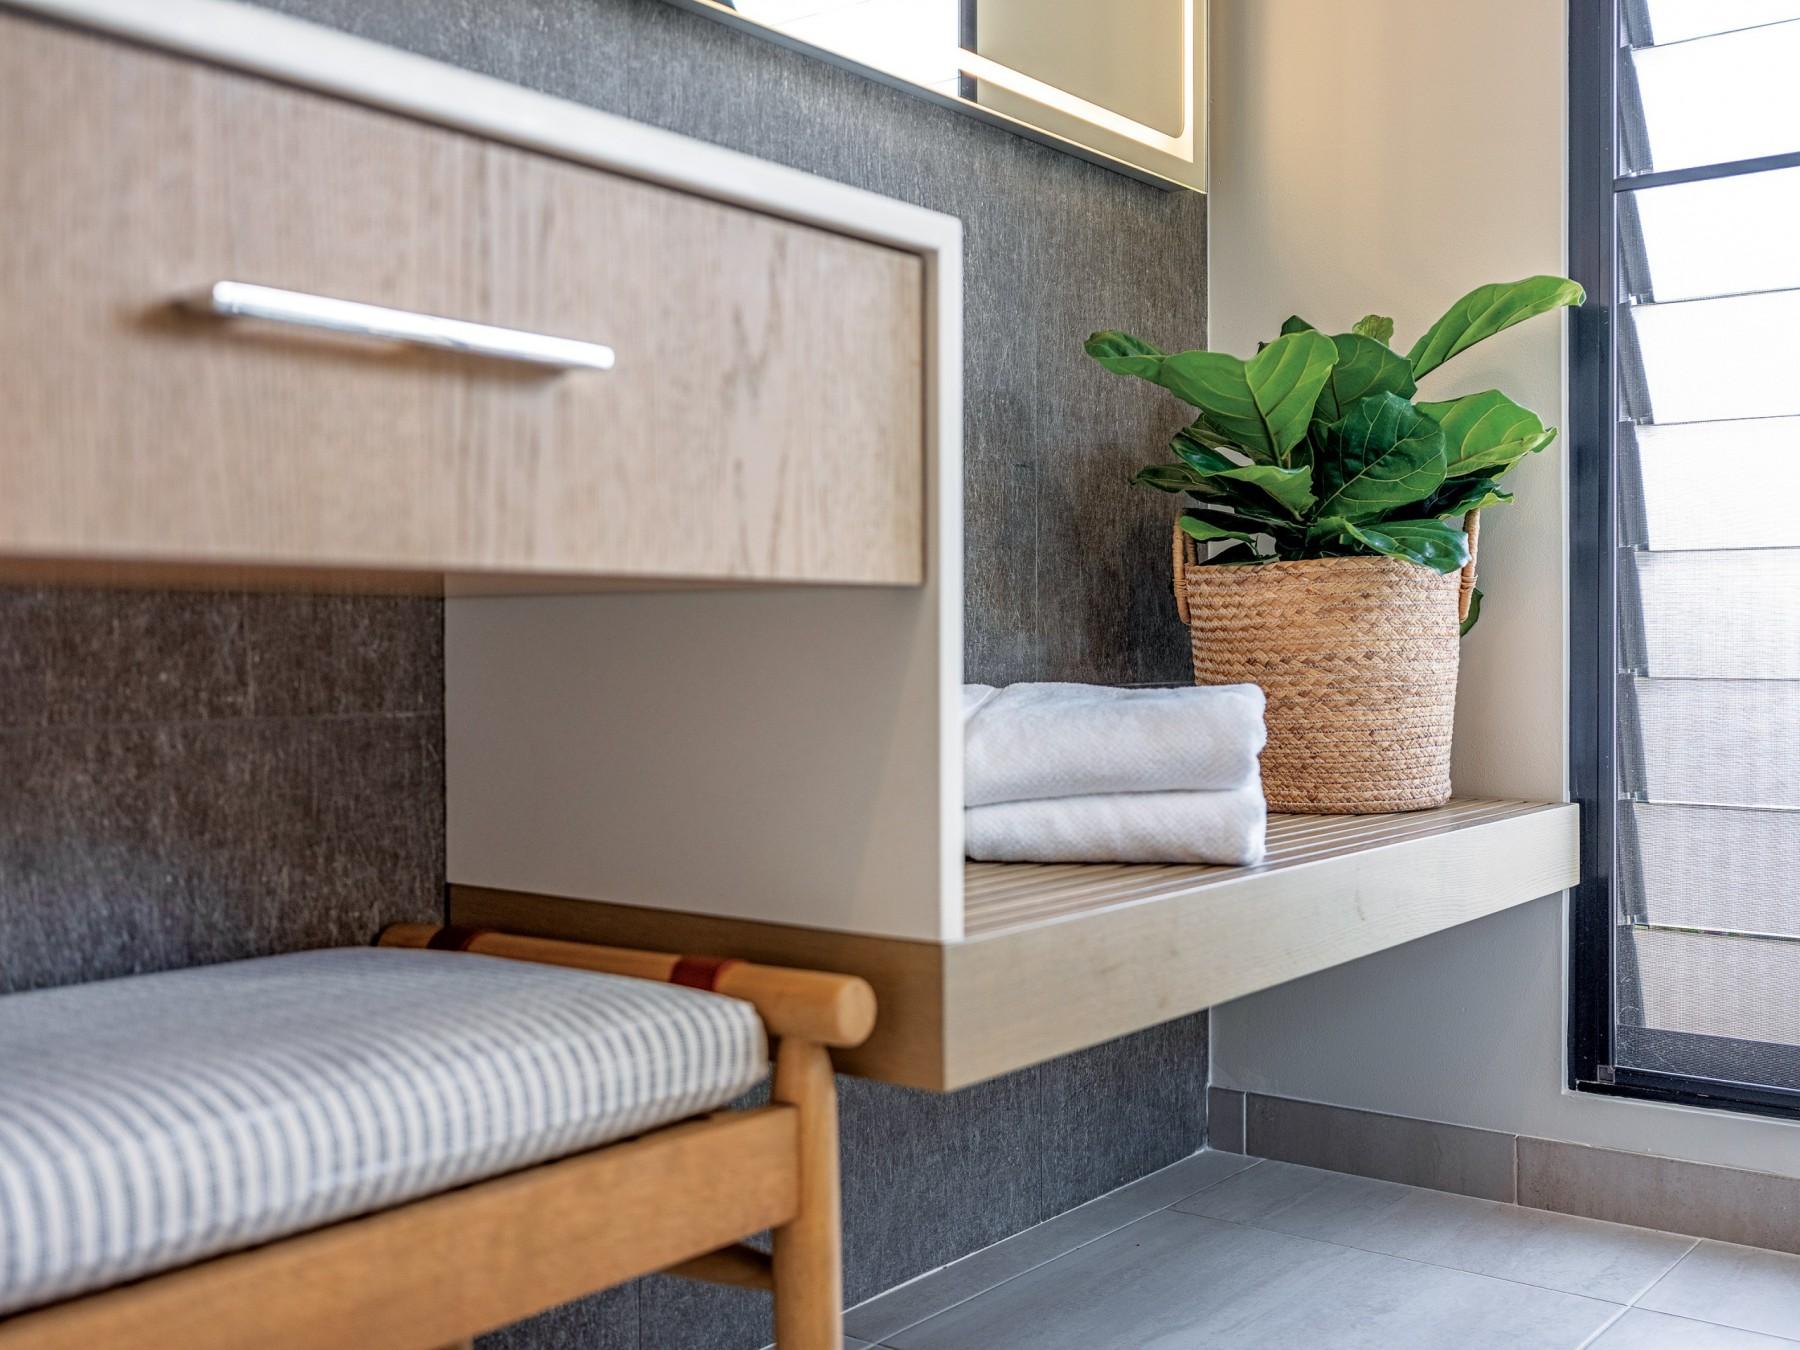 08 21 Hhr Feature Hawaii Kitchen Bath Bath 5